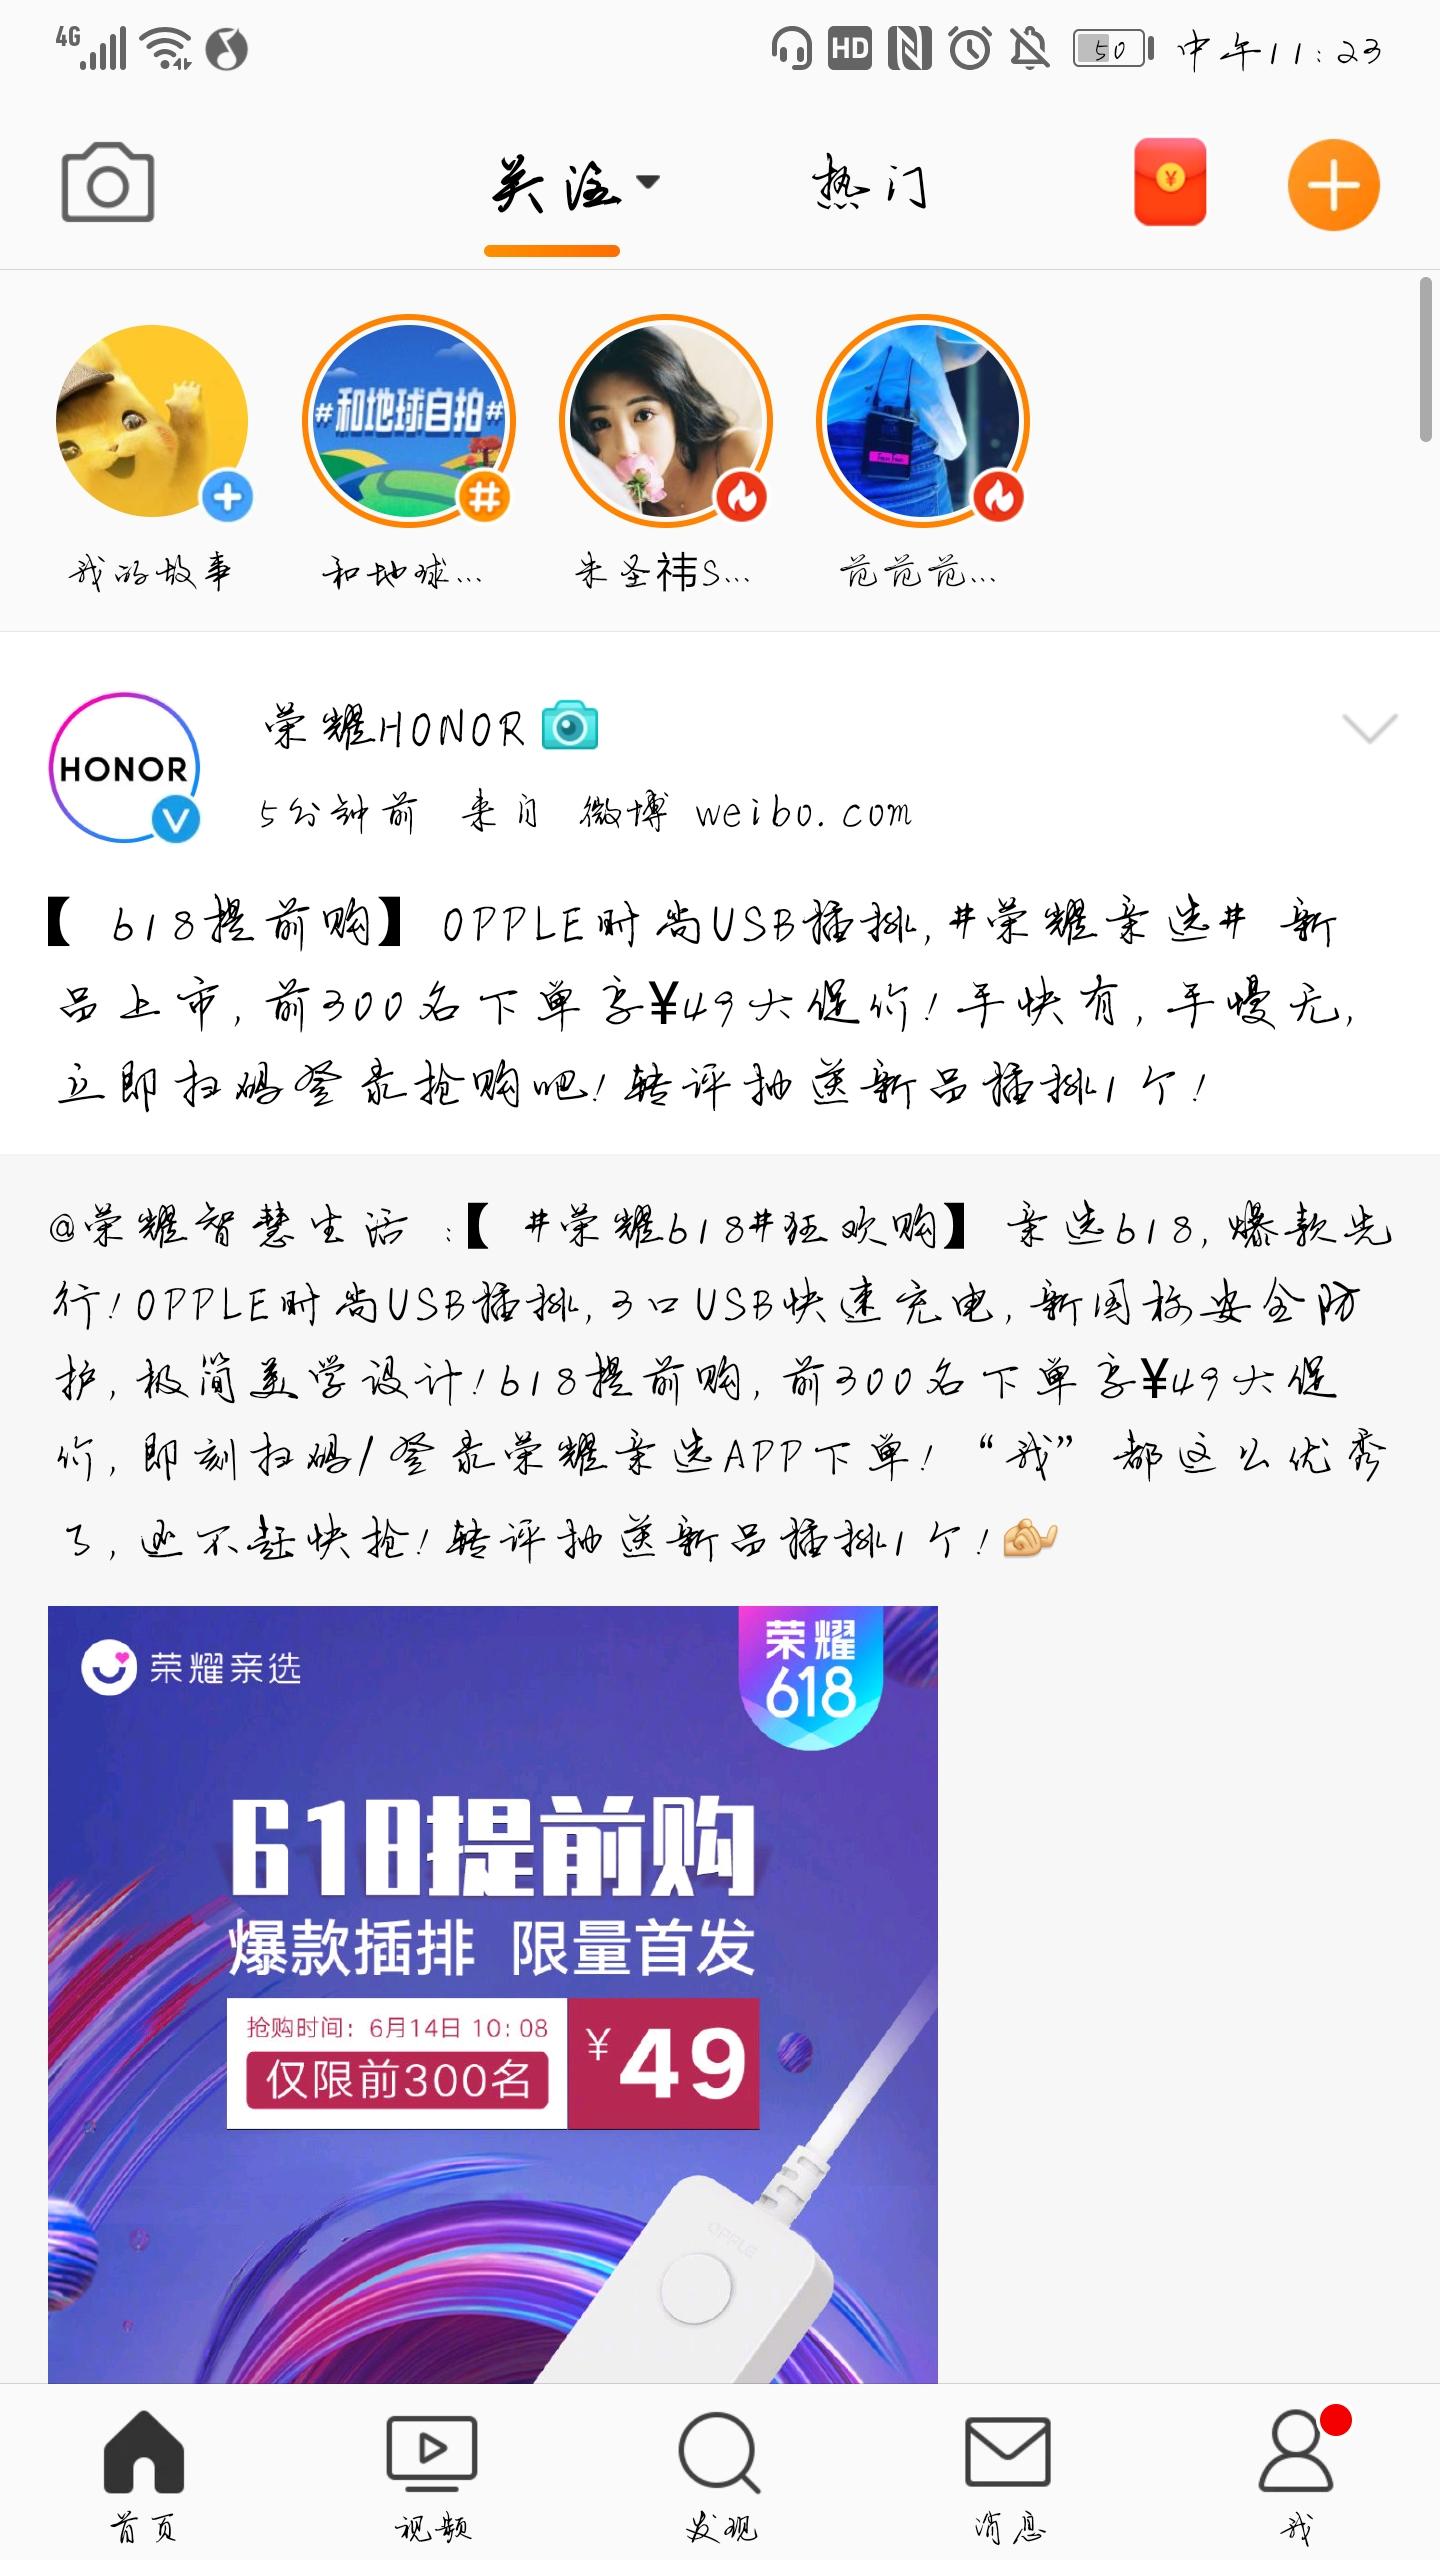 Screenshot_20190614_112355_com.sina.weibo.jpg